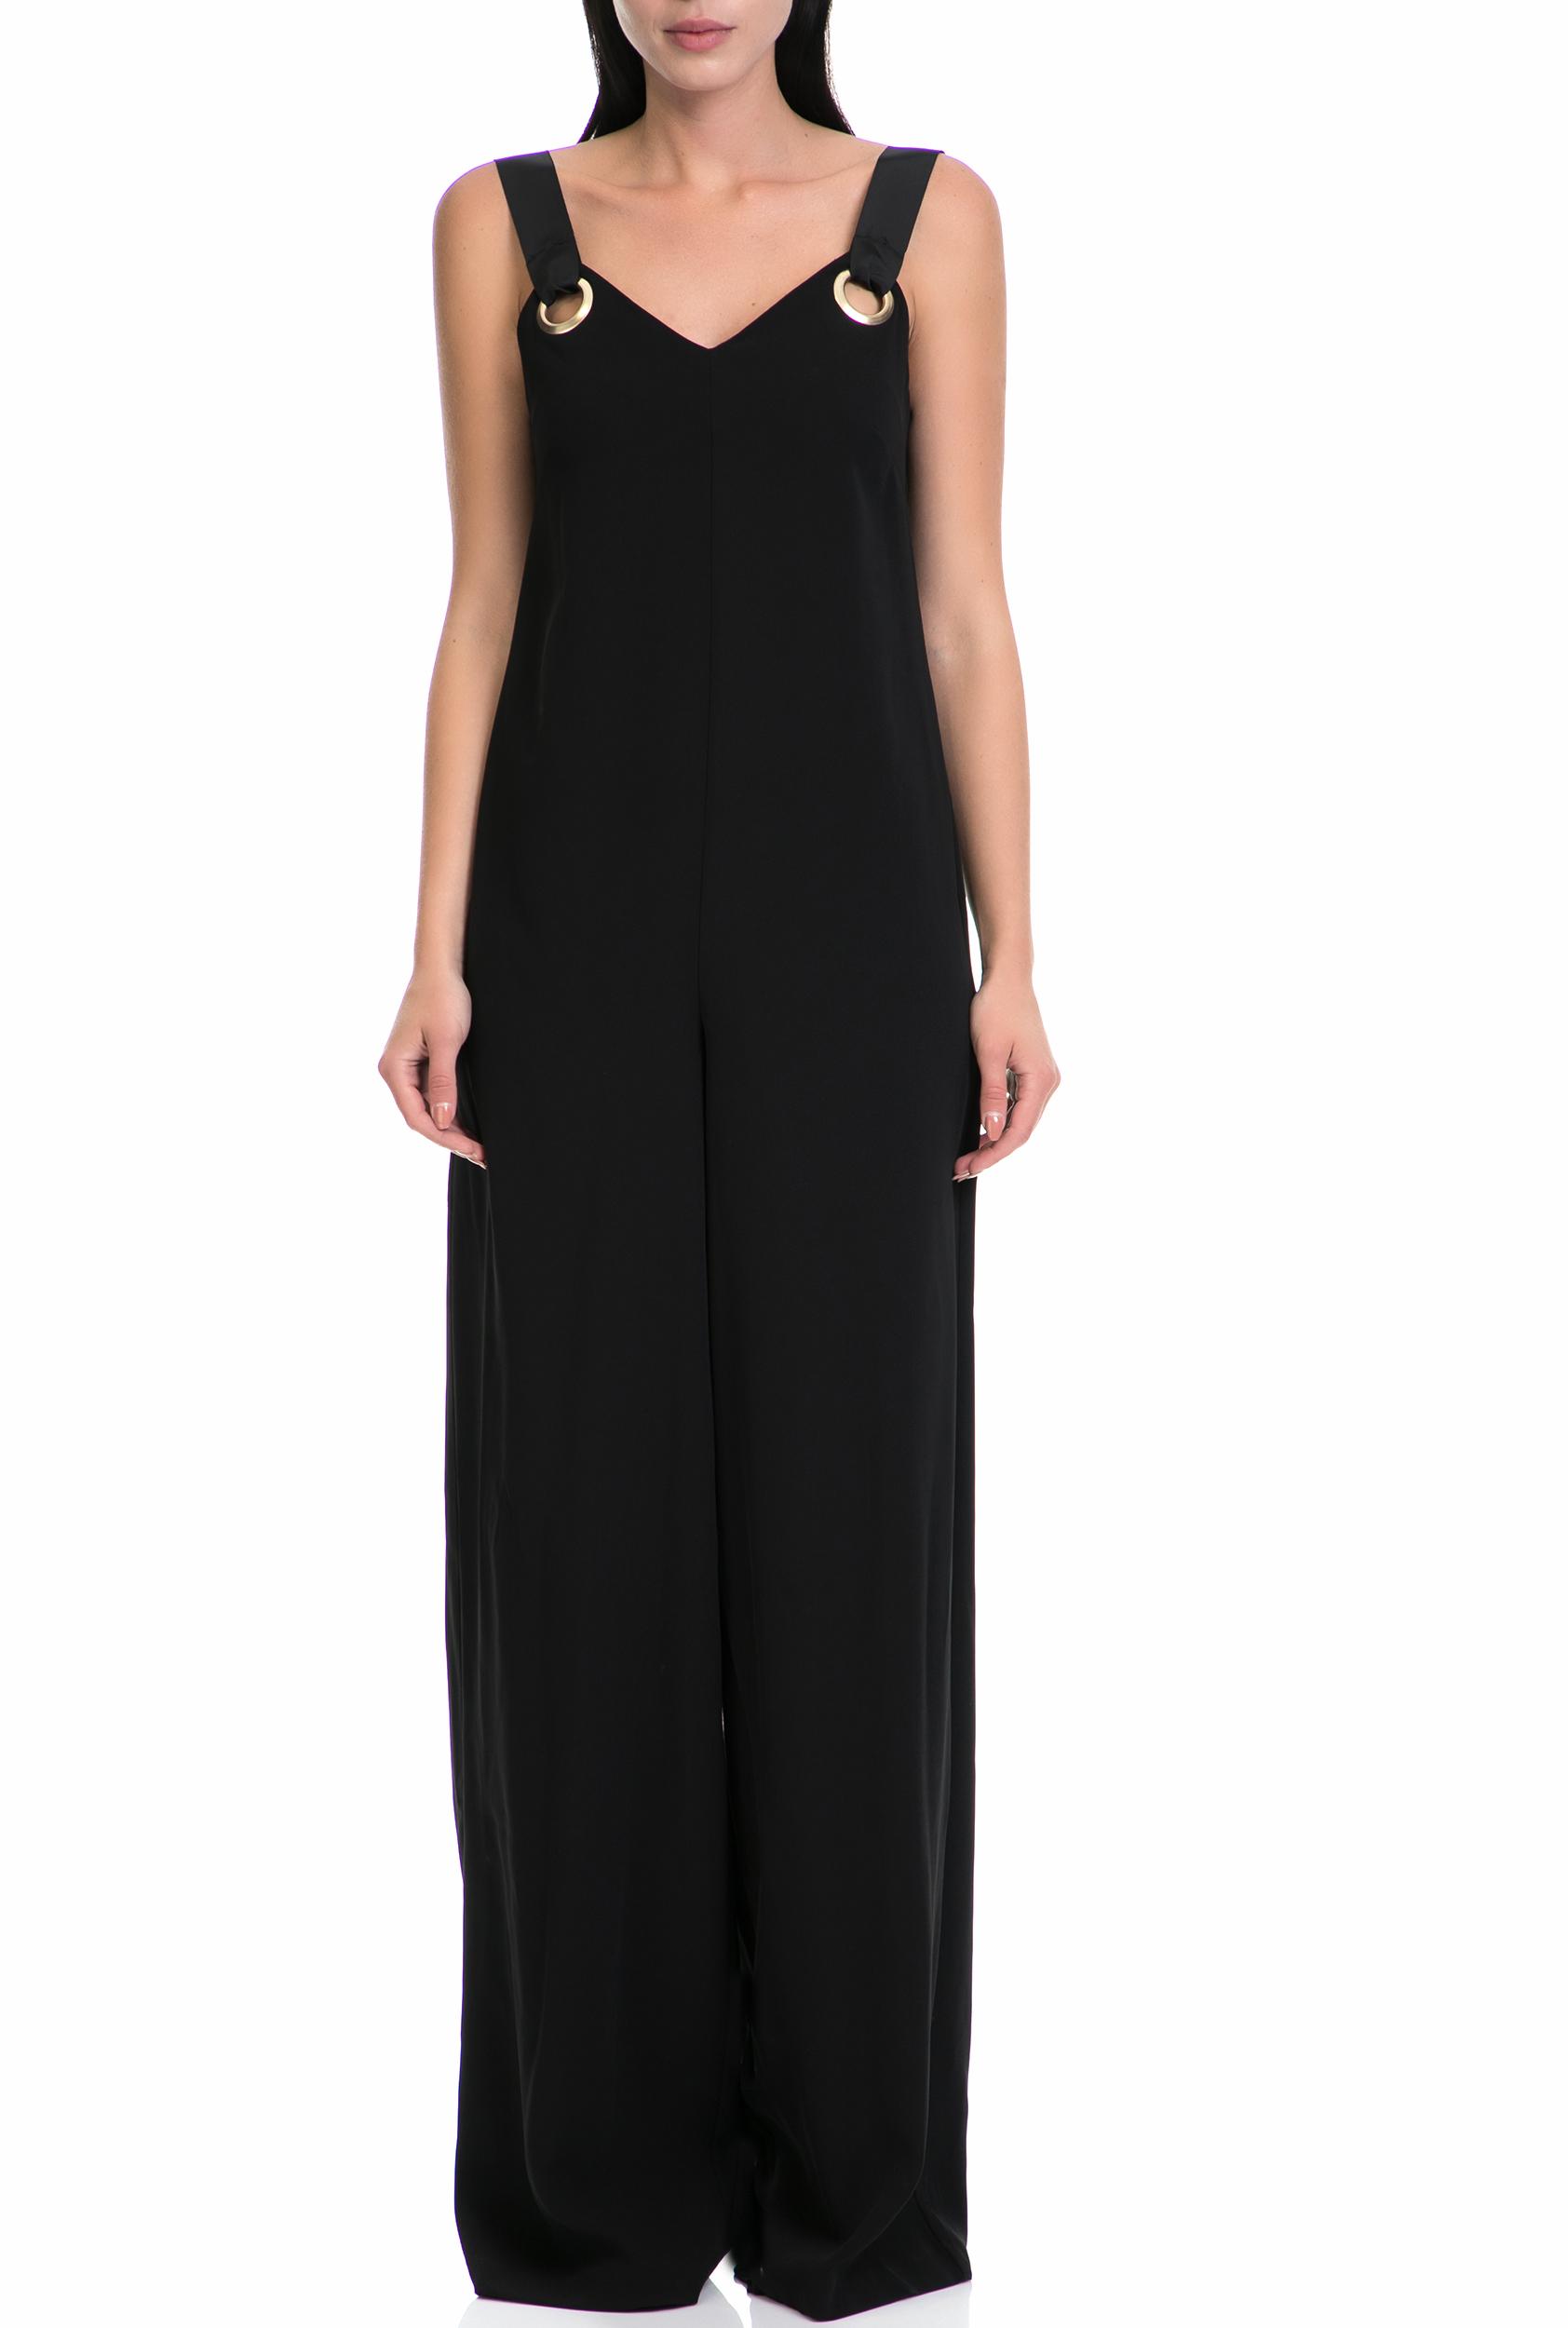 3f60b5416066 GUESS - Γυναικεία Φορέματα | Outfit.gr